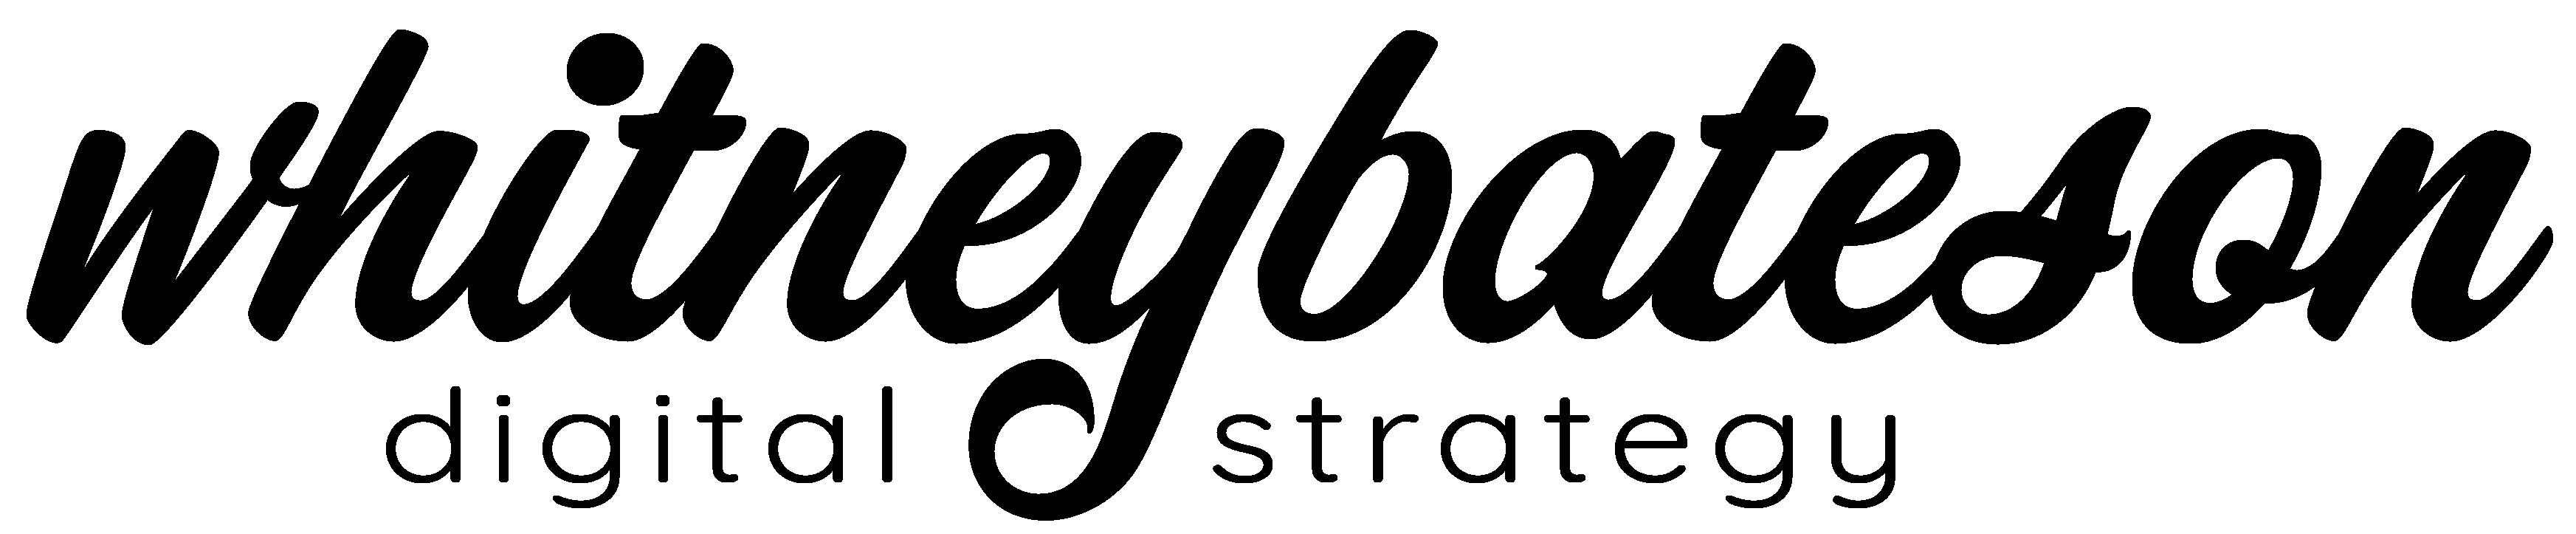 Whitney Bateson Digital Strategy Logo